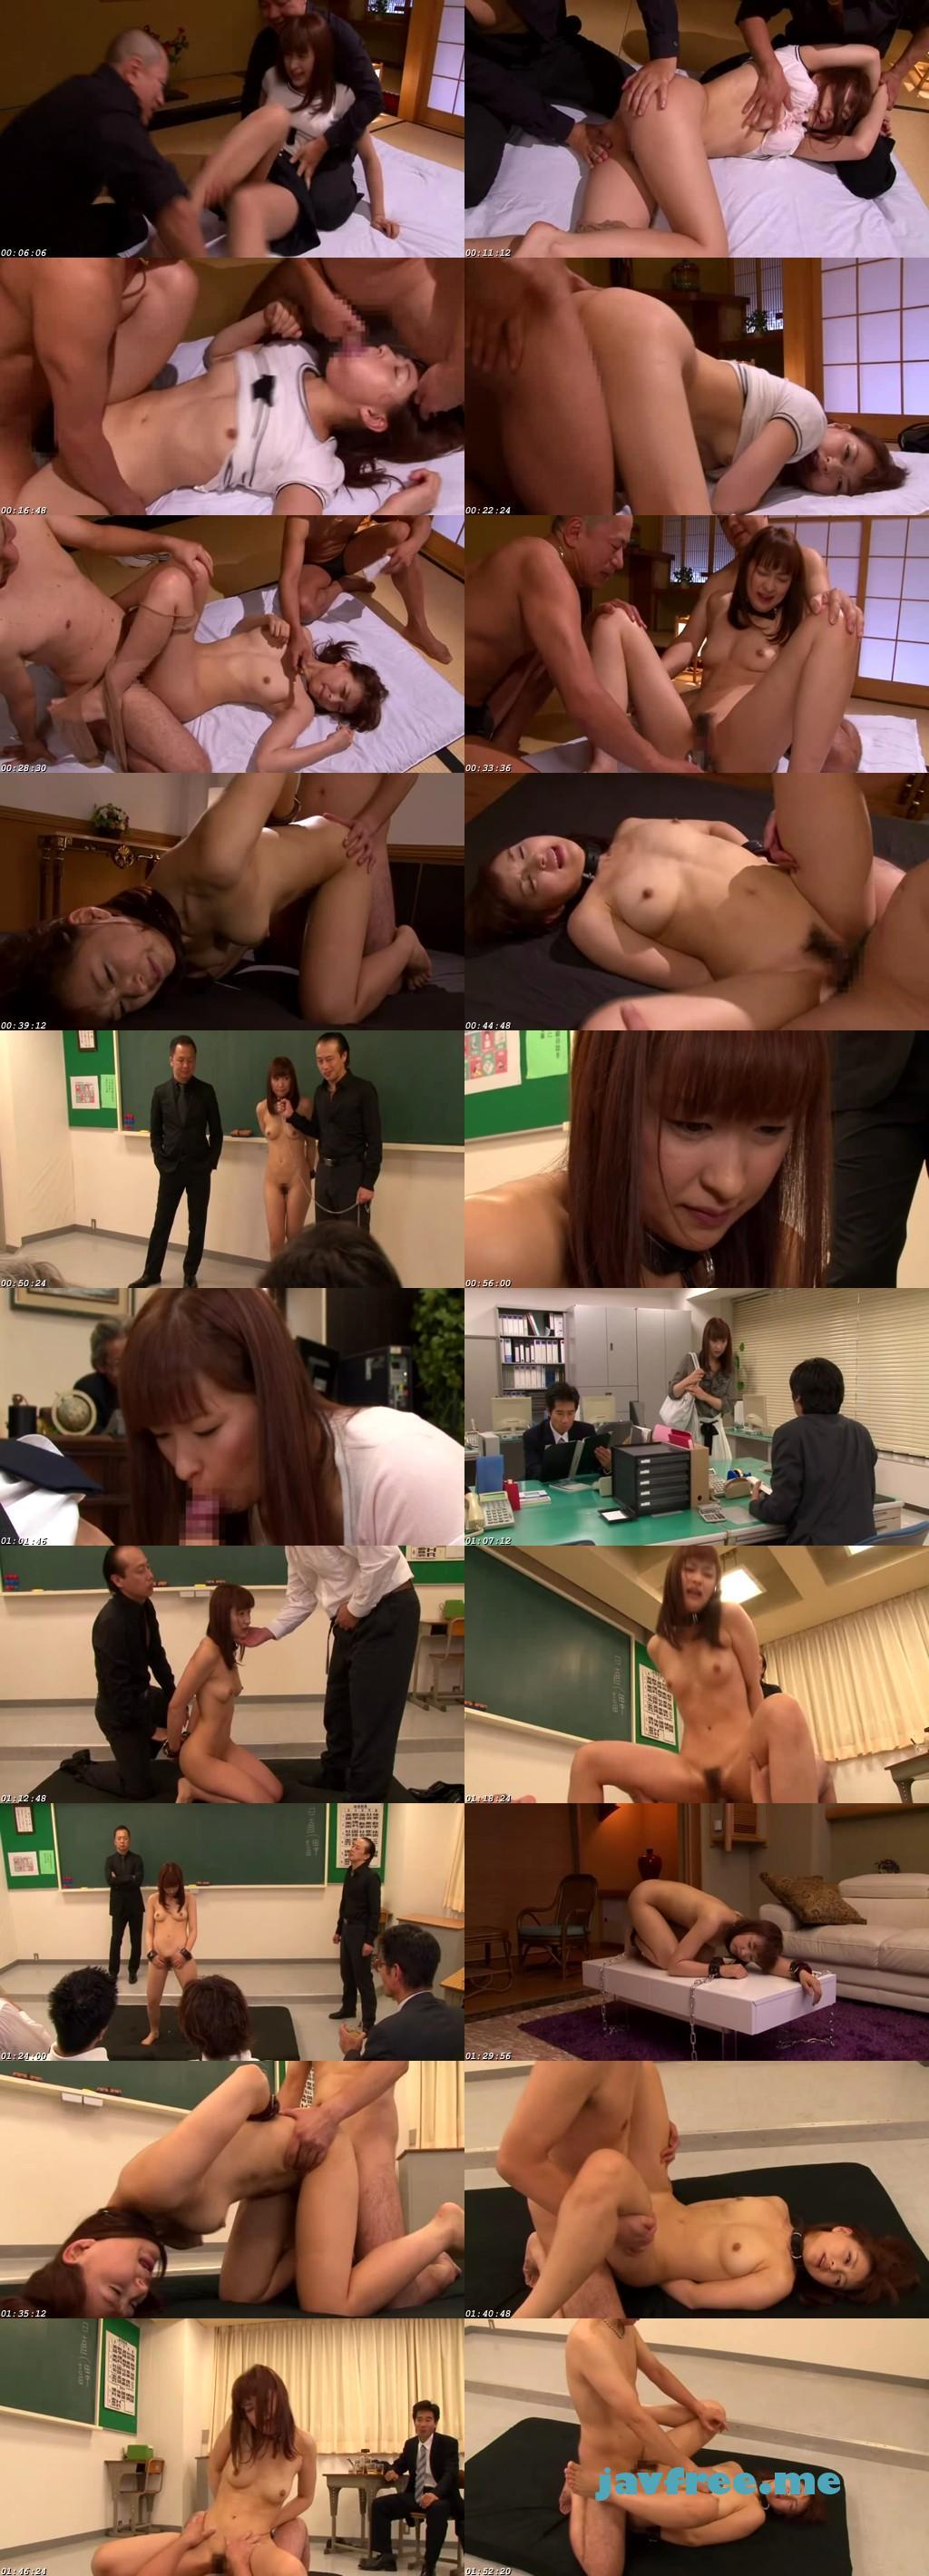 [RBD-444] 奴隷色の女教師8 周防ゆきこ - image RBD-444 on https://javfree.me